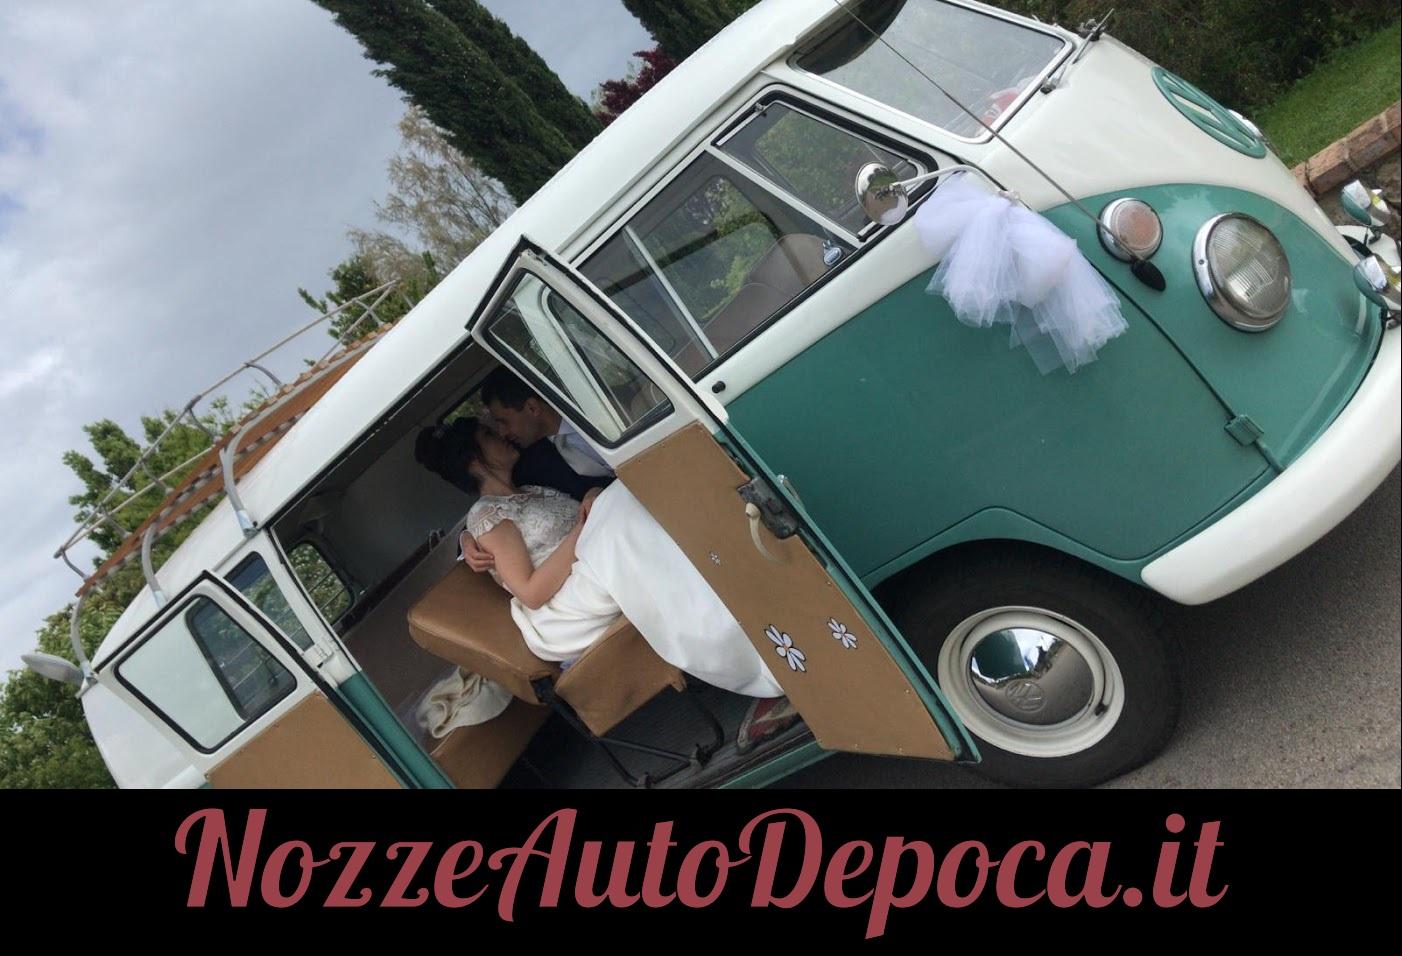 Pulmino T1 anni 60 - matrimoni Roma  - auto matrimonio Roma - noleggio auto storiche - noleggio pulmino vintage - noleggio auto d'epoca - noleggio auto matrimoni Roma - Noleggio Auto matrimoni - nozze auto - auto matrimonio Roma